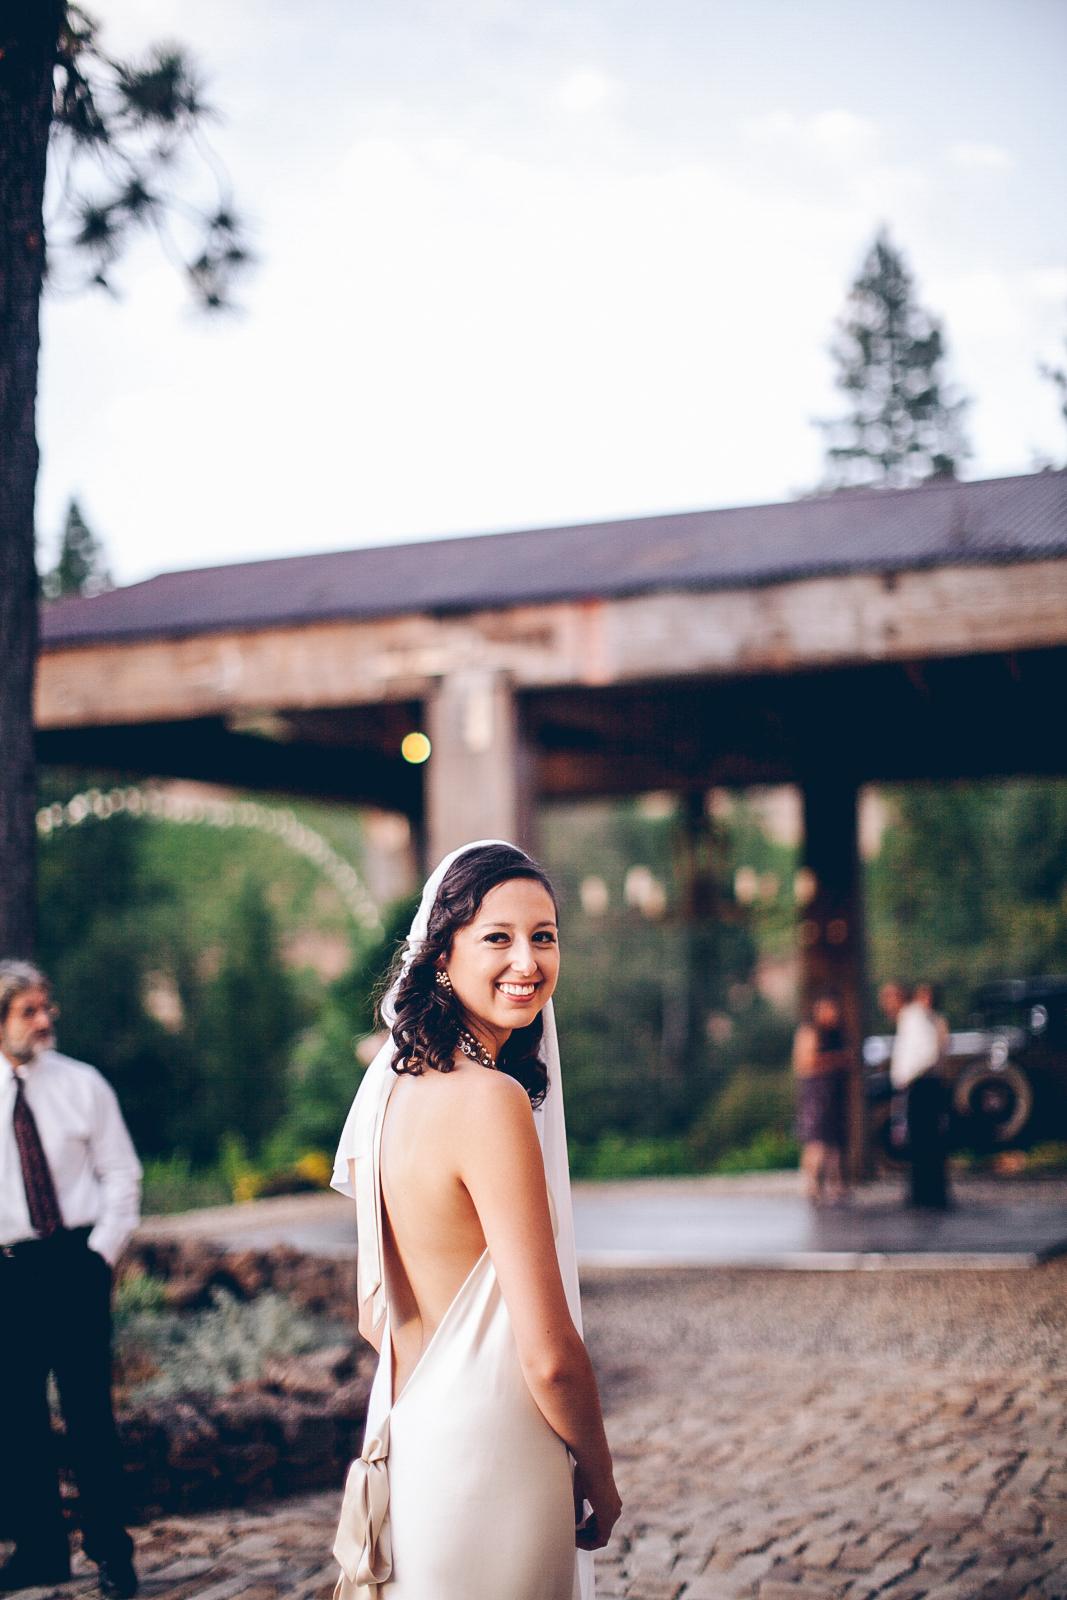 miraflores_winery_wedding_photography_ian_melissa_ebony_siovhan_bokeh_photography_66.jpg